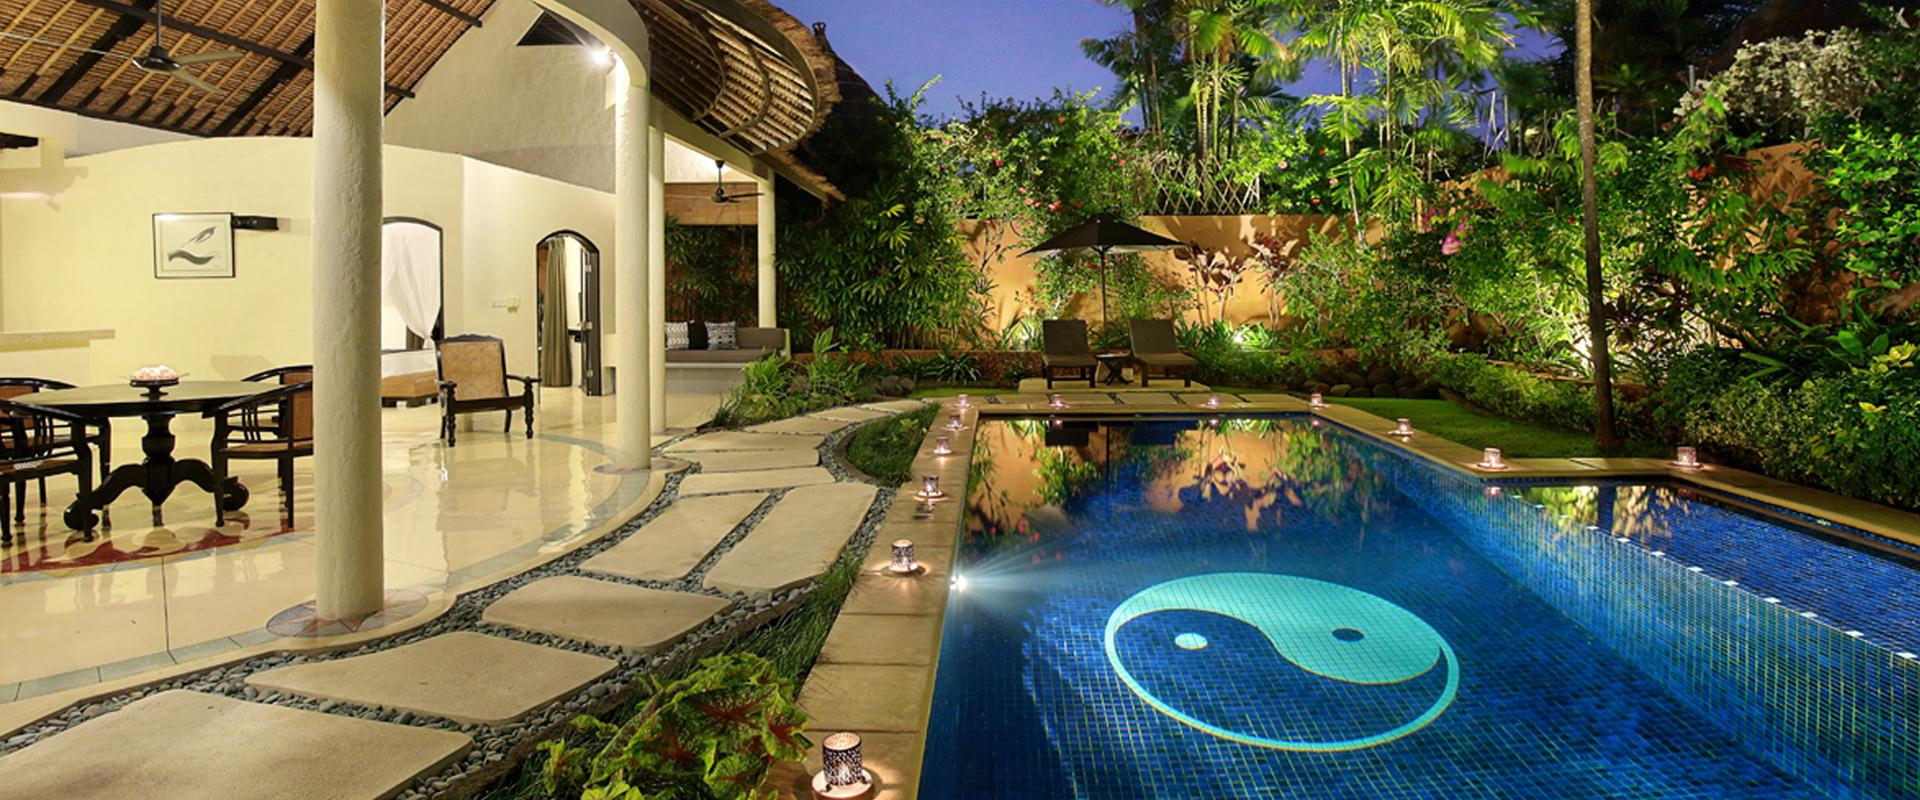 The Villas Bali Hotel Spa